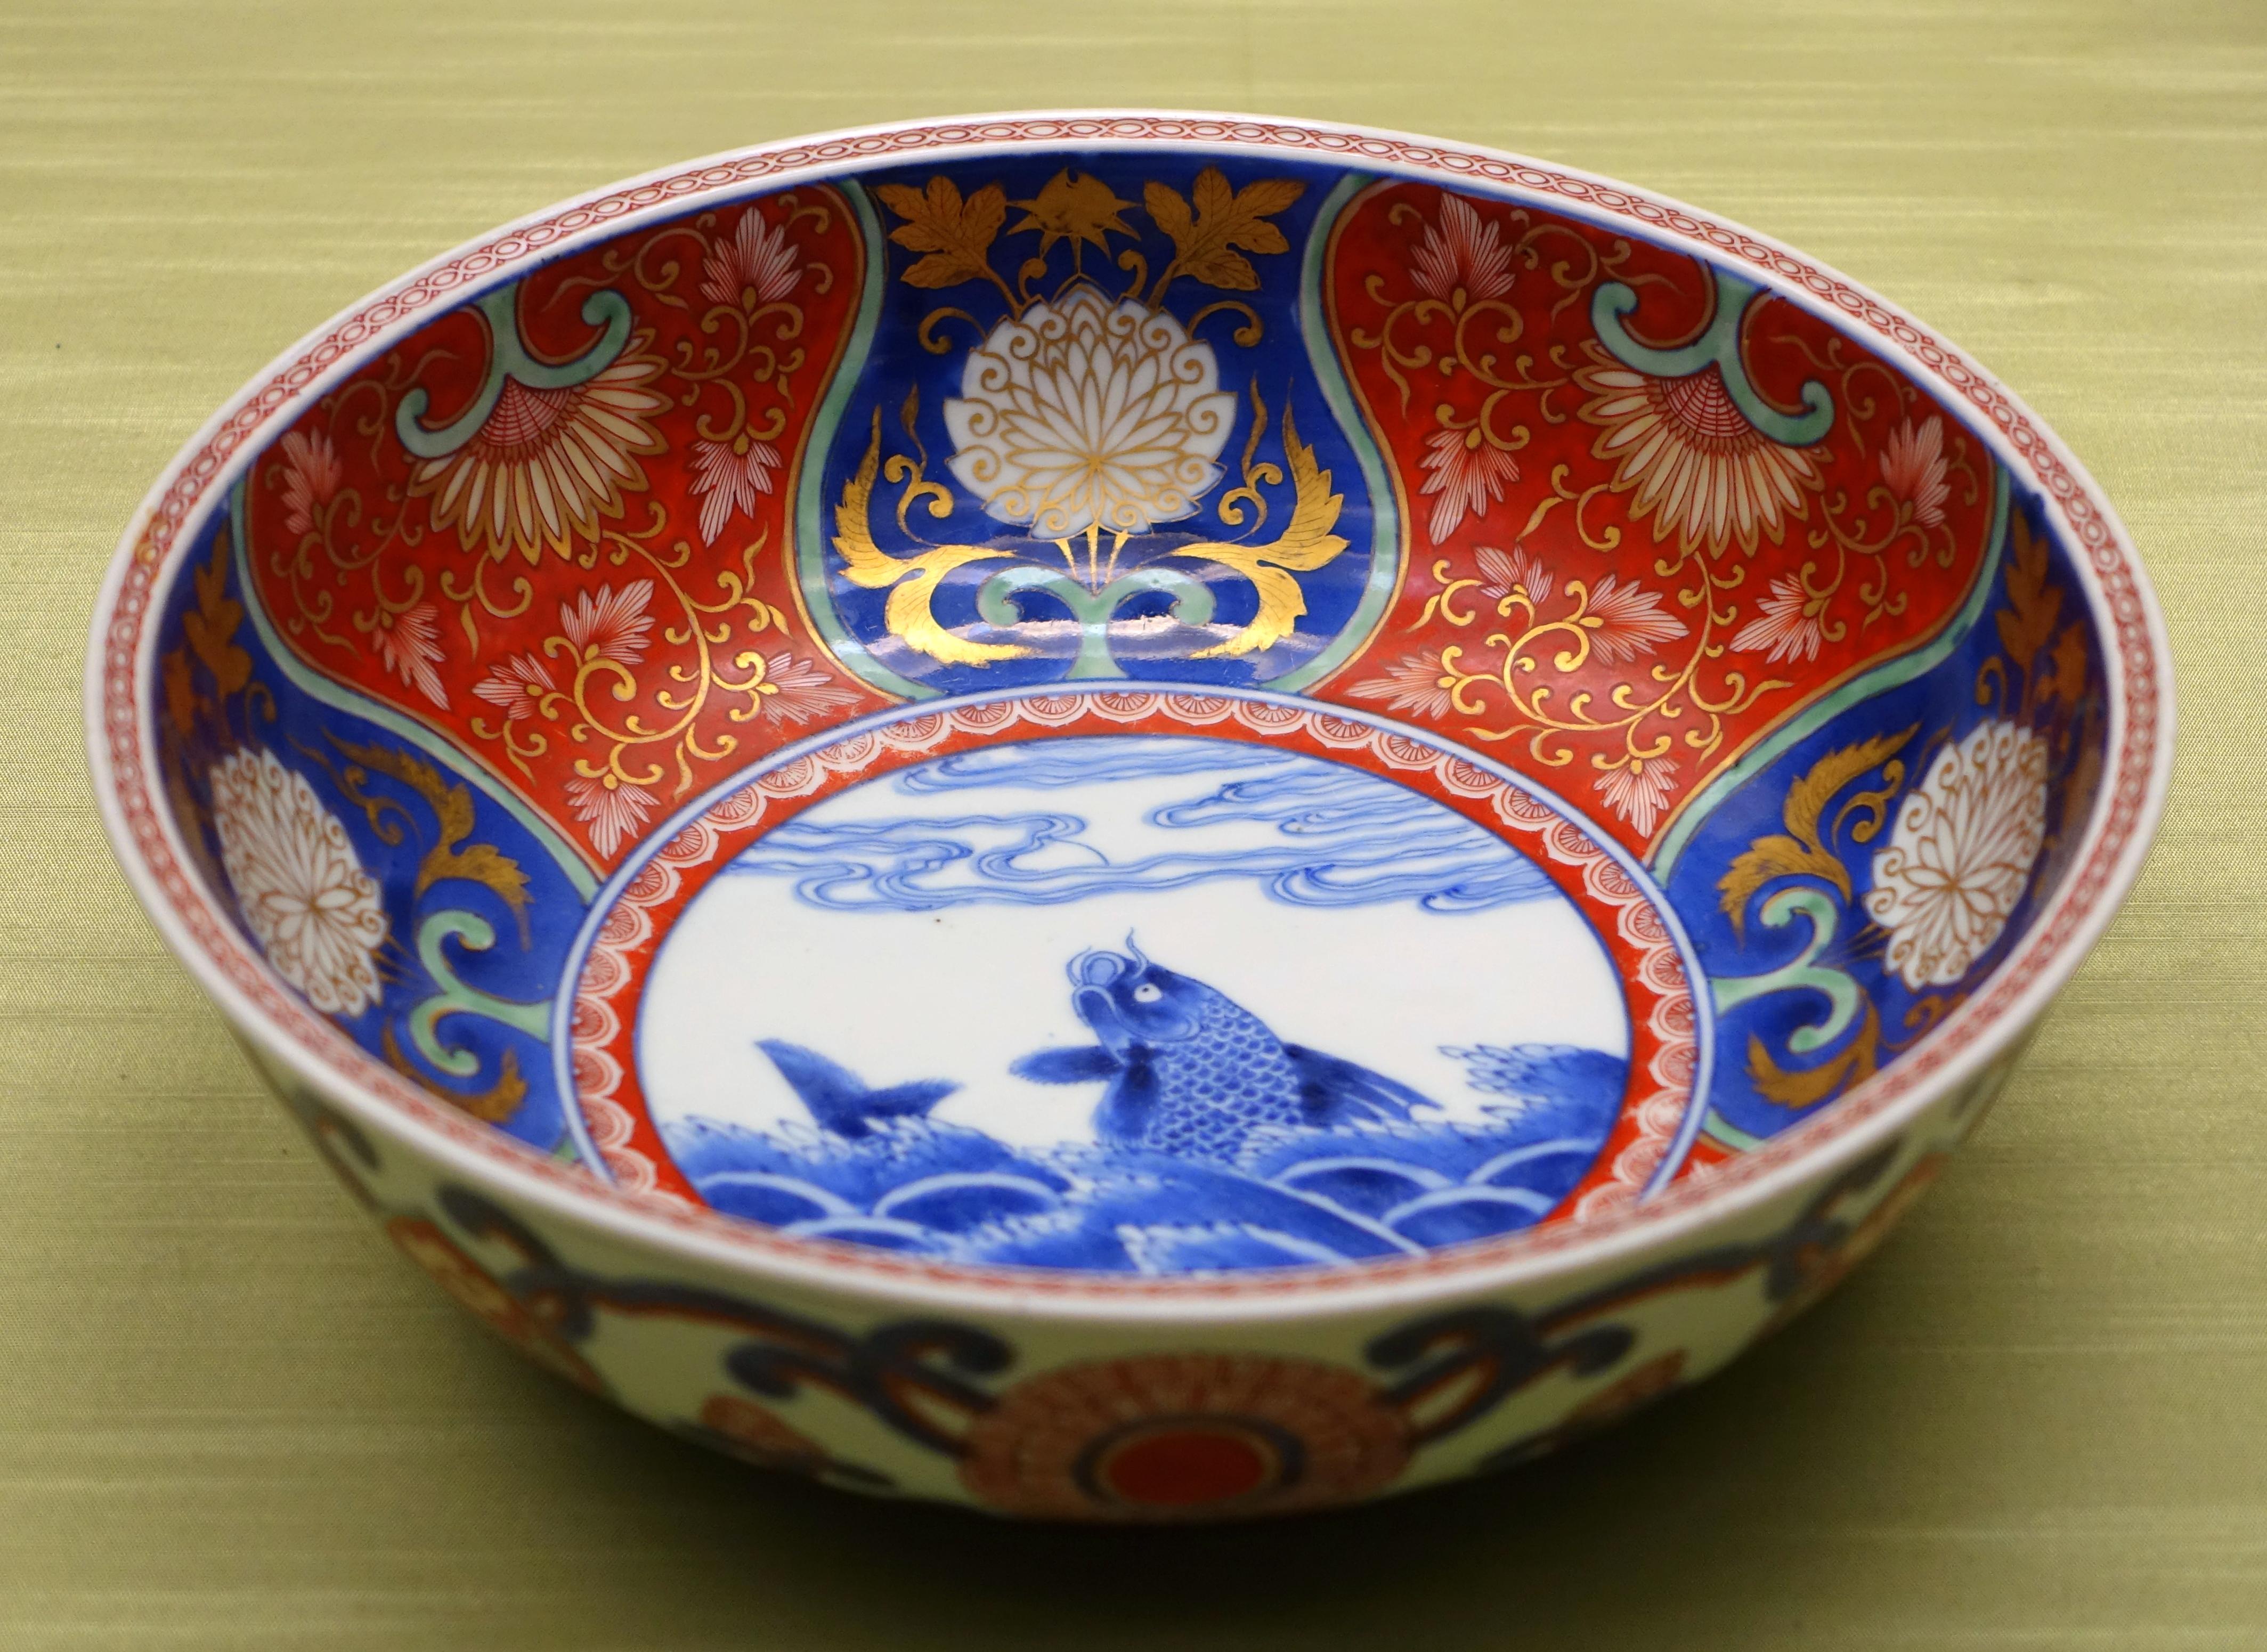 File:Bowl with rough waves design, 8 of 8, Imari ware, Edo period